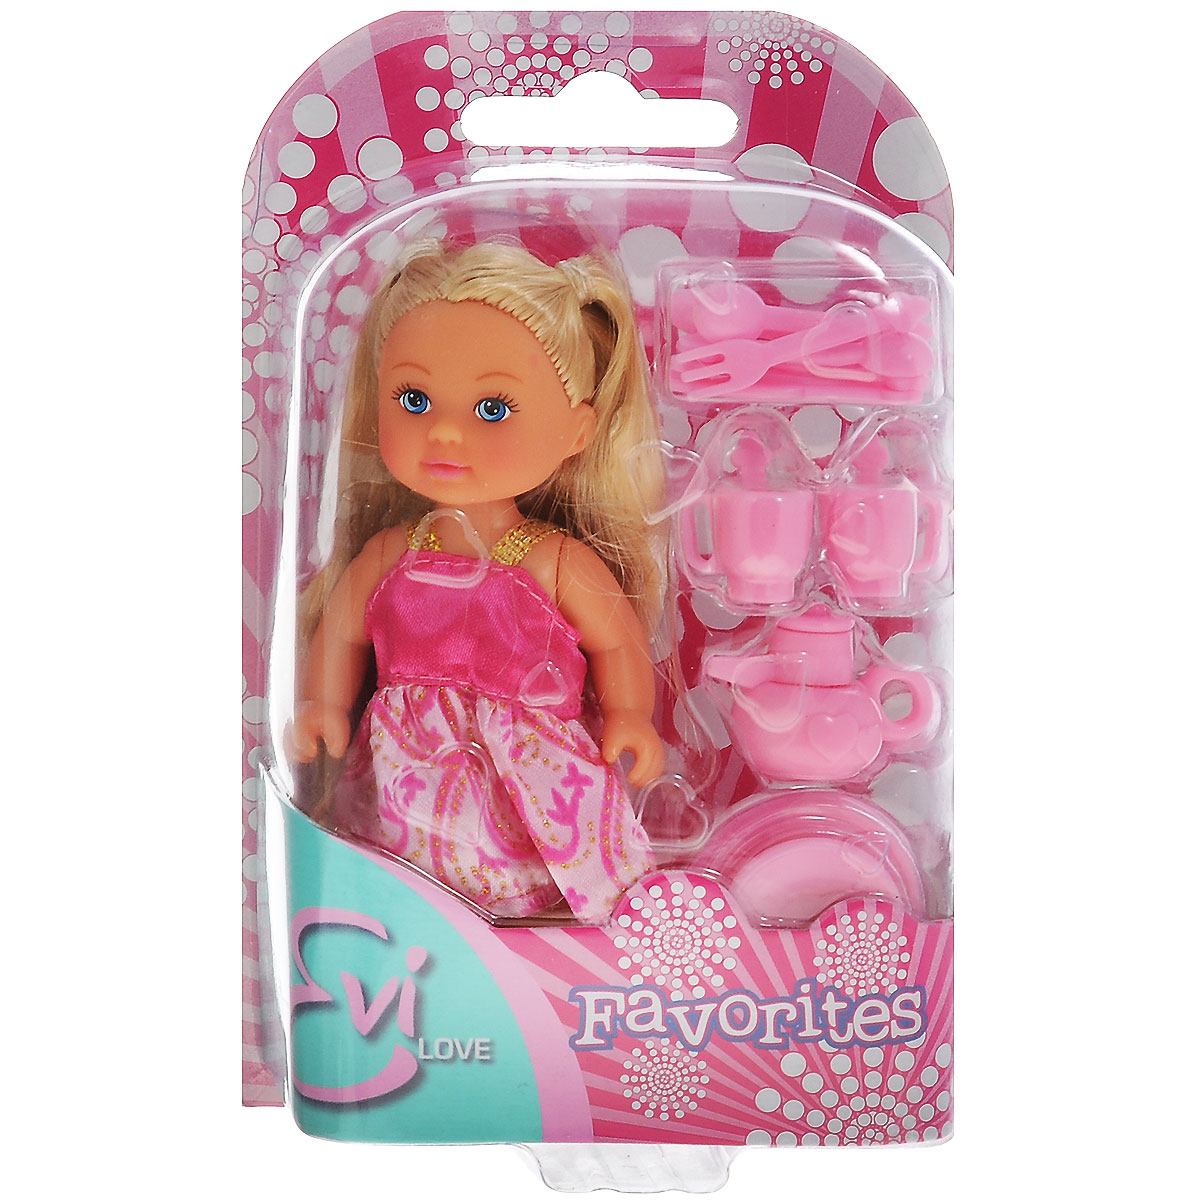 Simba Кукла Еви, с кухонными аксессуарами кукла simba еви и аксессуары в ассортименте